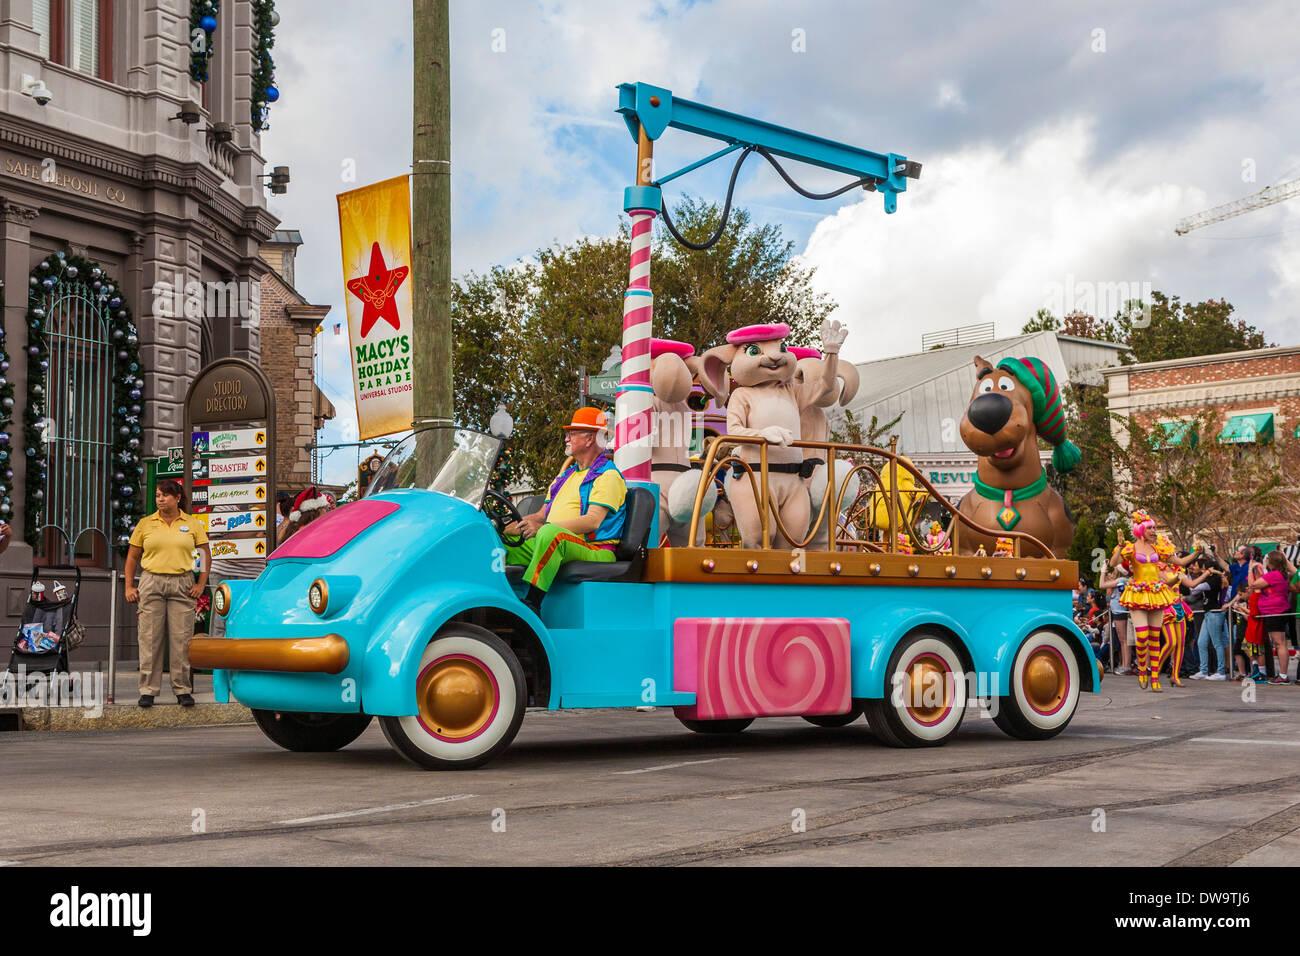 Cartoon Characters Universal Studios : Cartoon characters in parade at universal studios theme